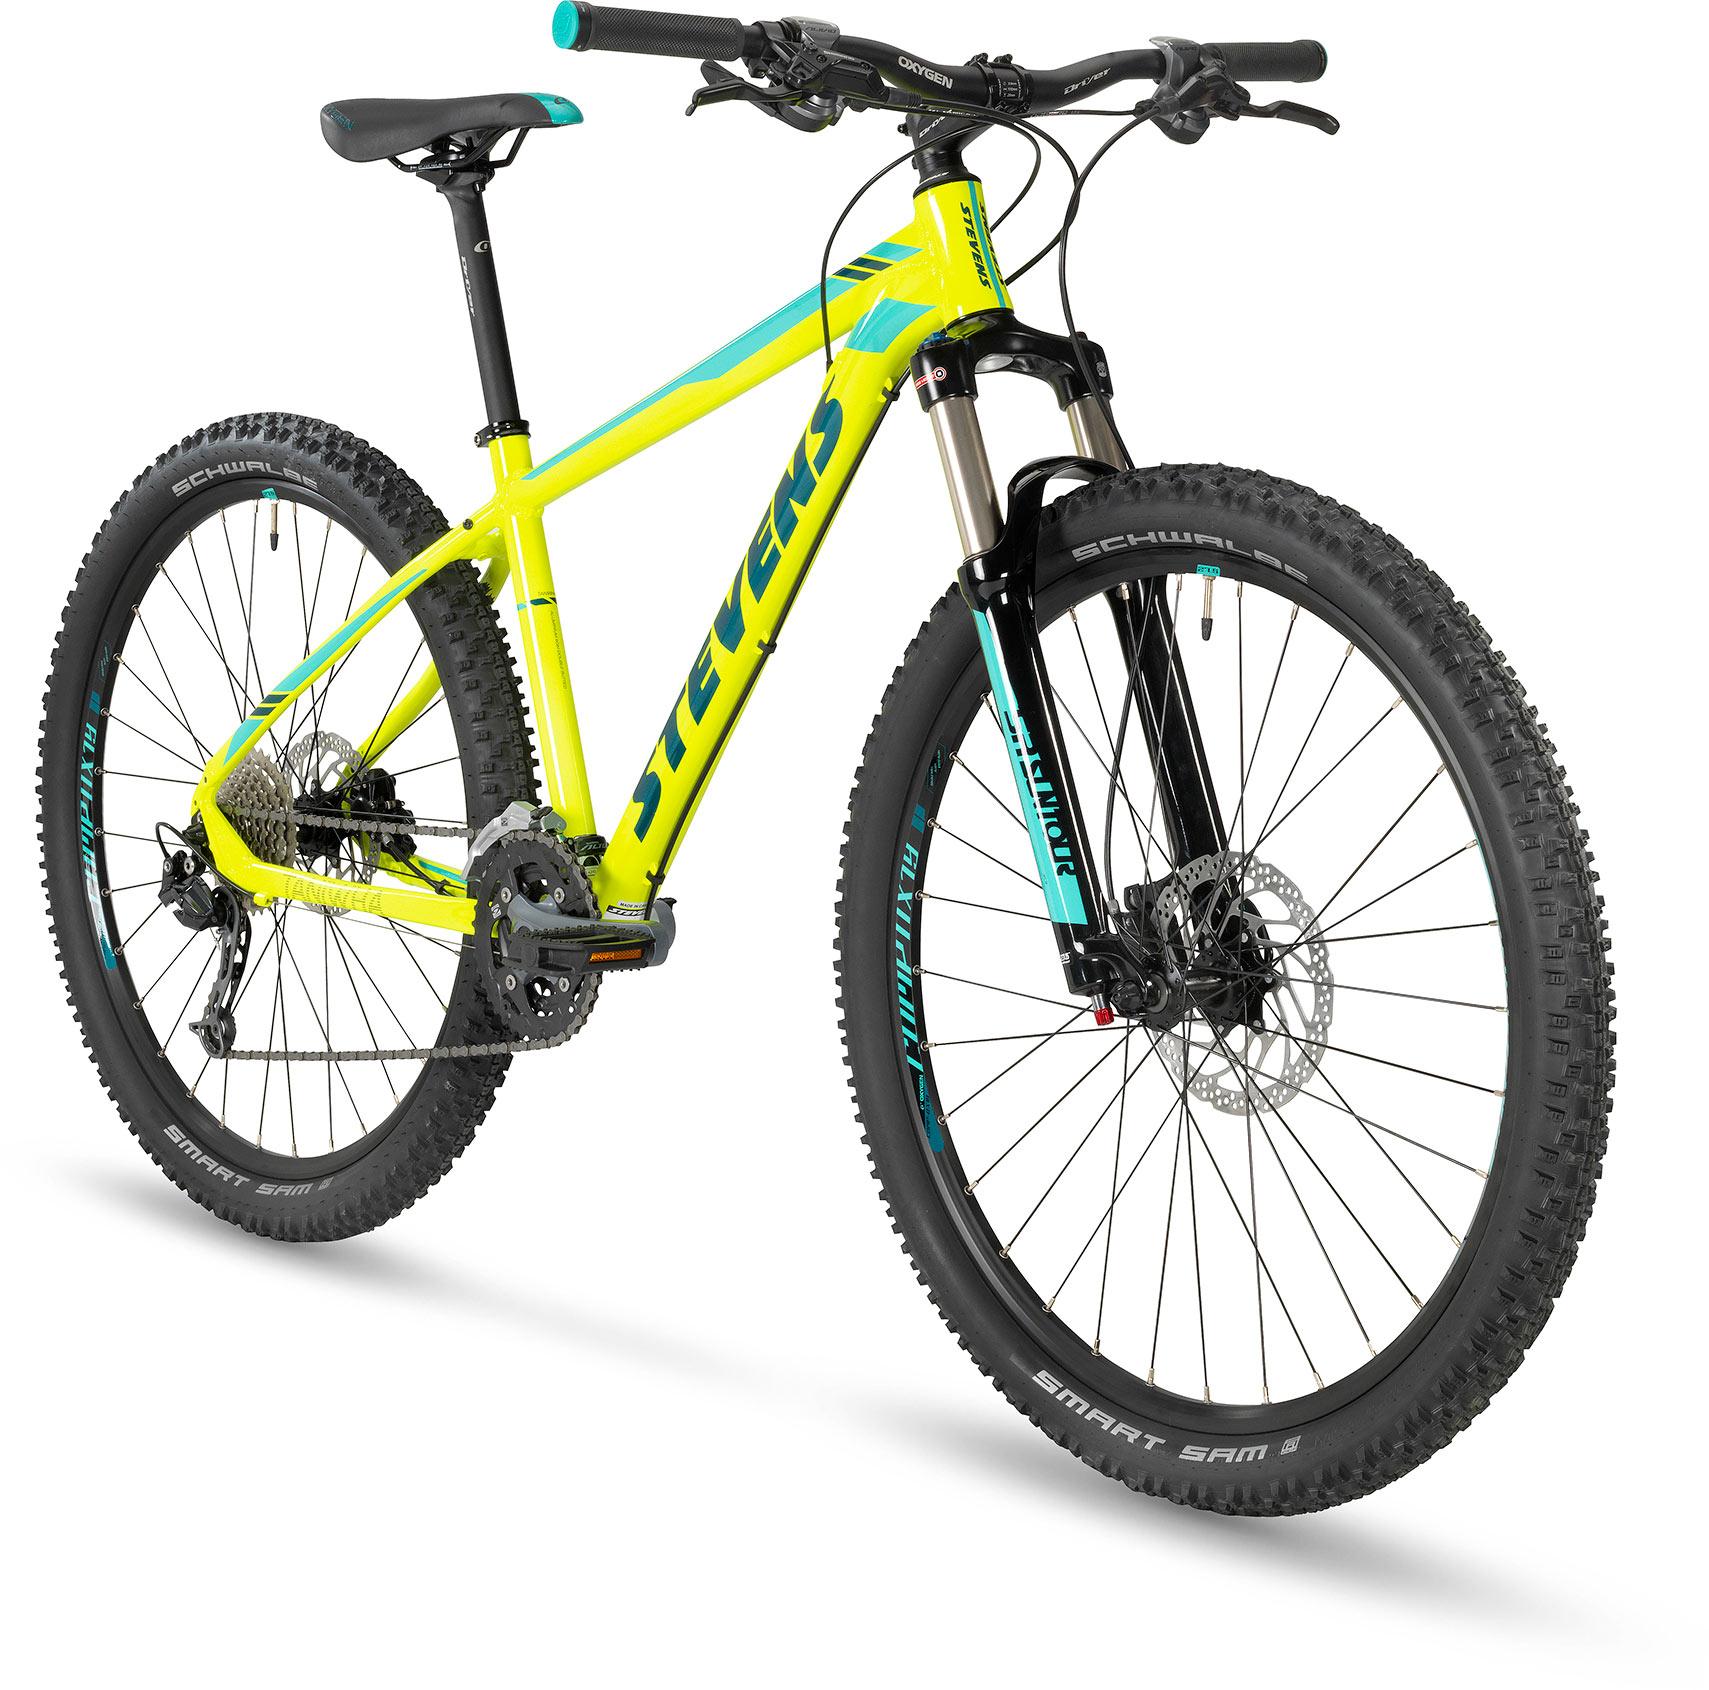 Taniwha - Stevens Bikes 2018